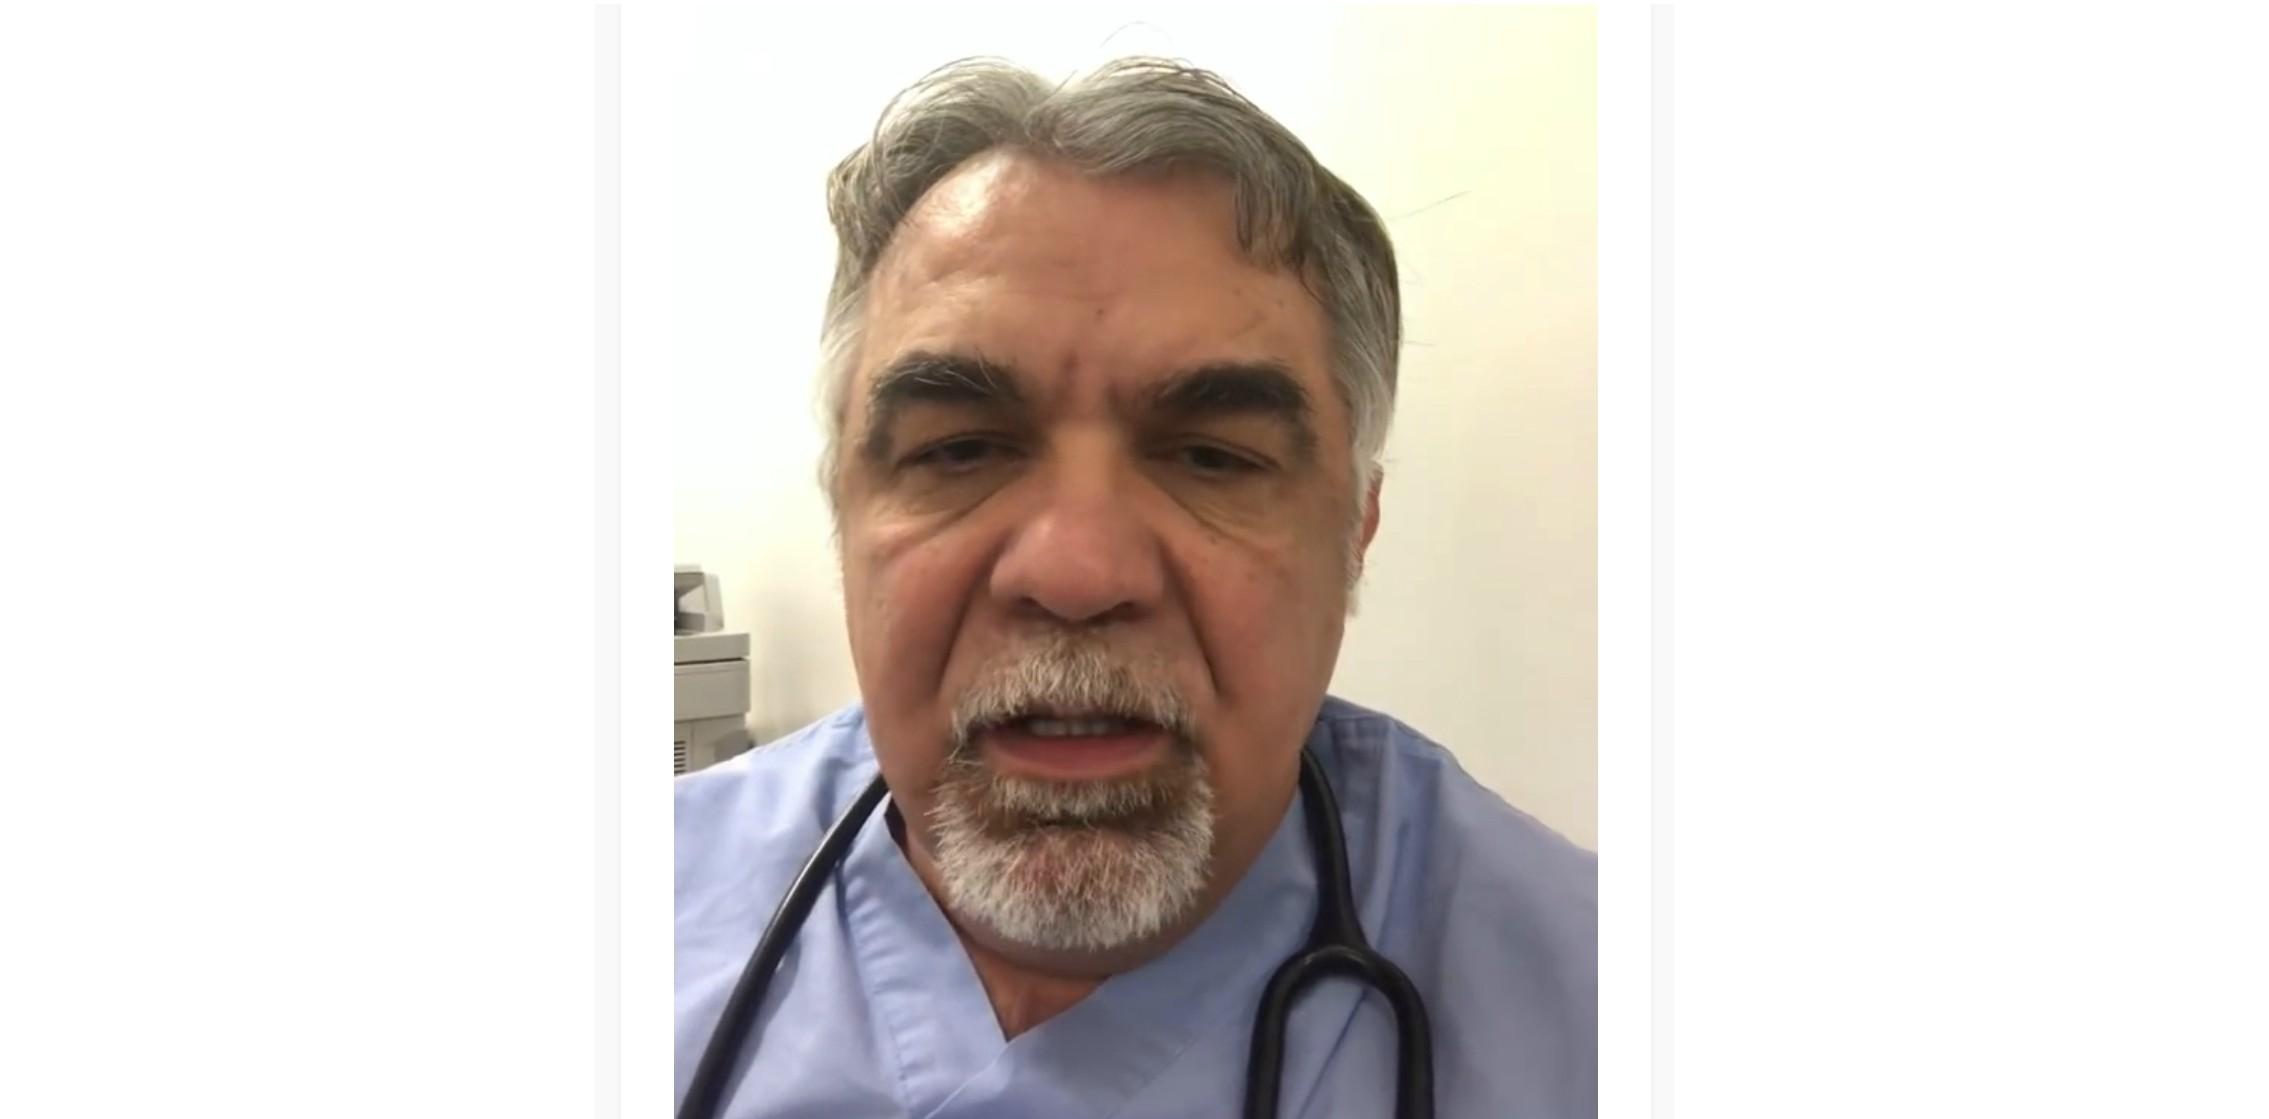 doctorul bate la vedere tratați deficiența de vedere